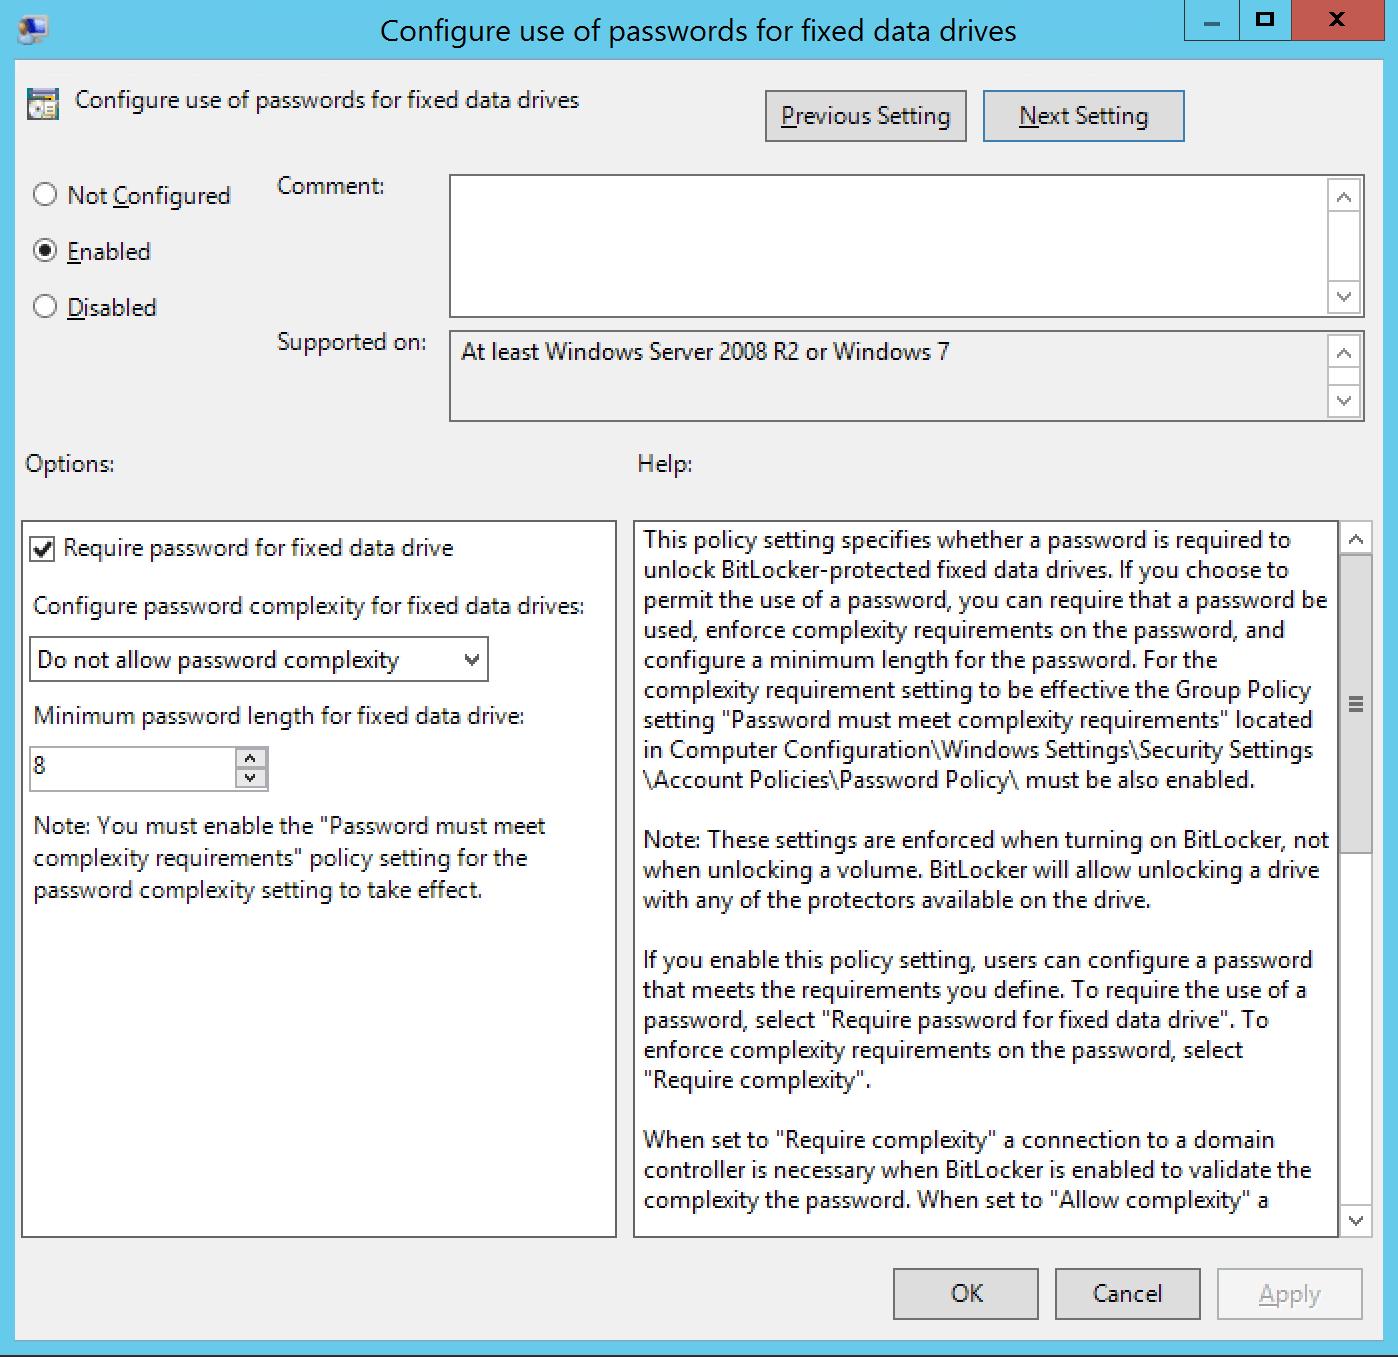 Configure use password